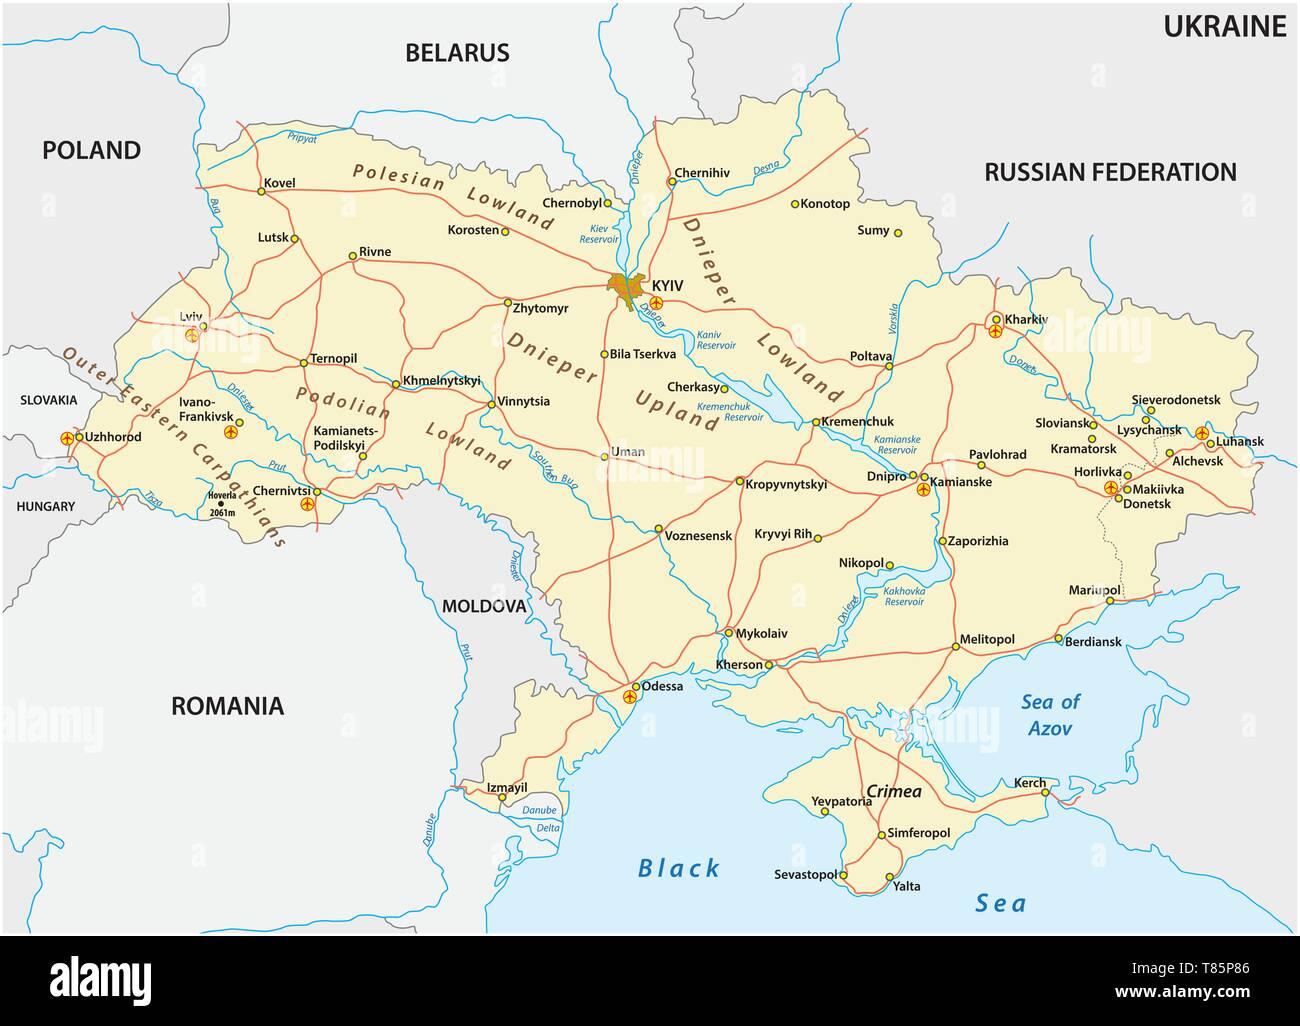 Cartina Geografica Russia Ucraina.Map Russia Poland Ukraine Immagini E Fotos Stock Alamy